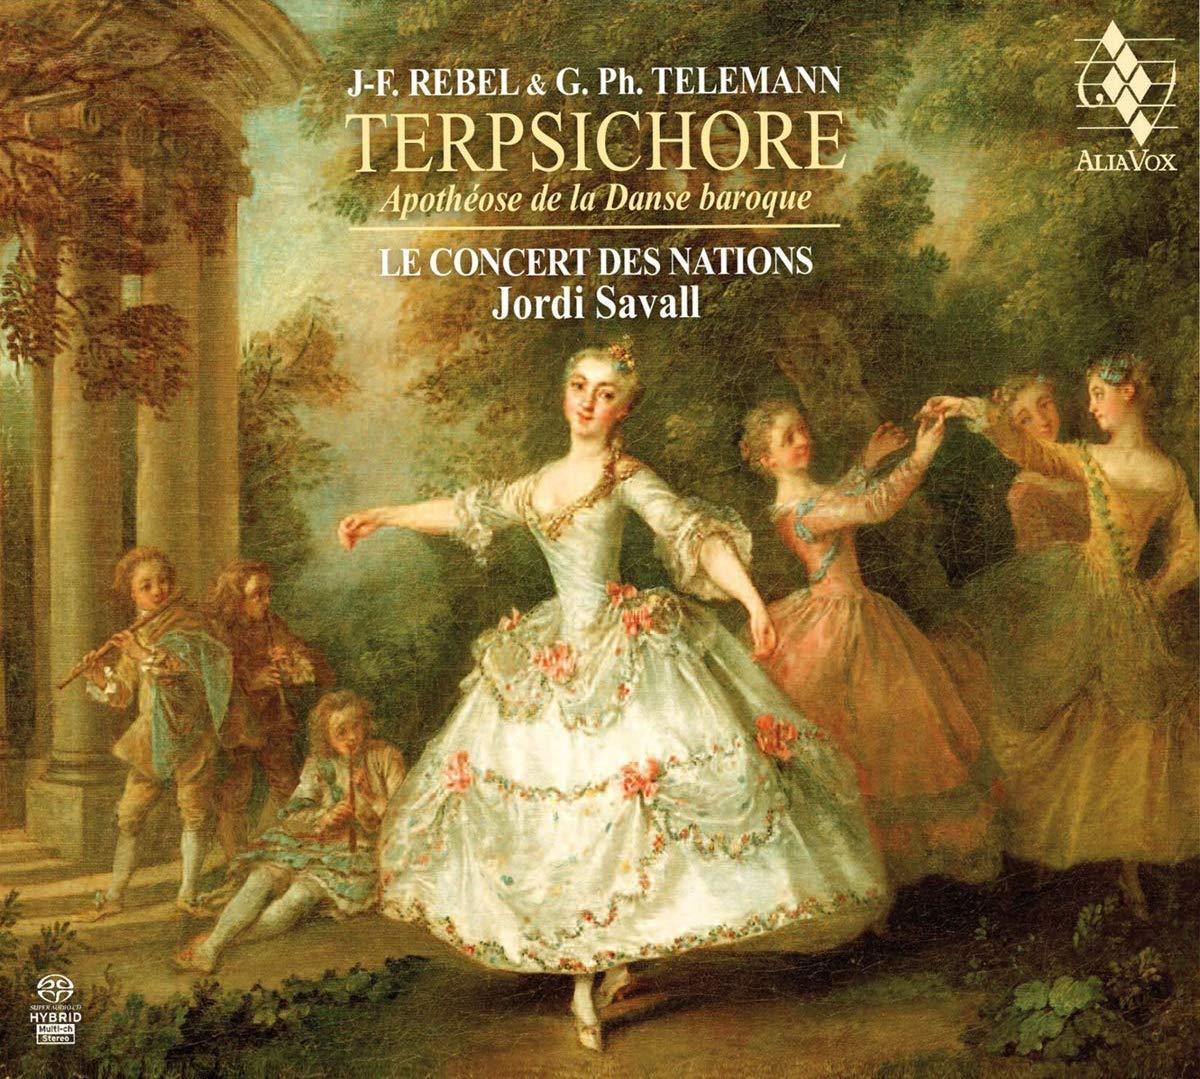 Jordi Savall - Page 3 Terpsichore-danses-louis-xv-telemann-rebel-jordi-savall-cd-critique-review-cd-classiquenews